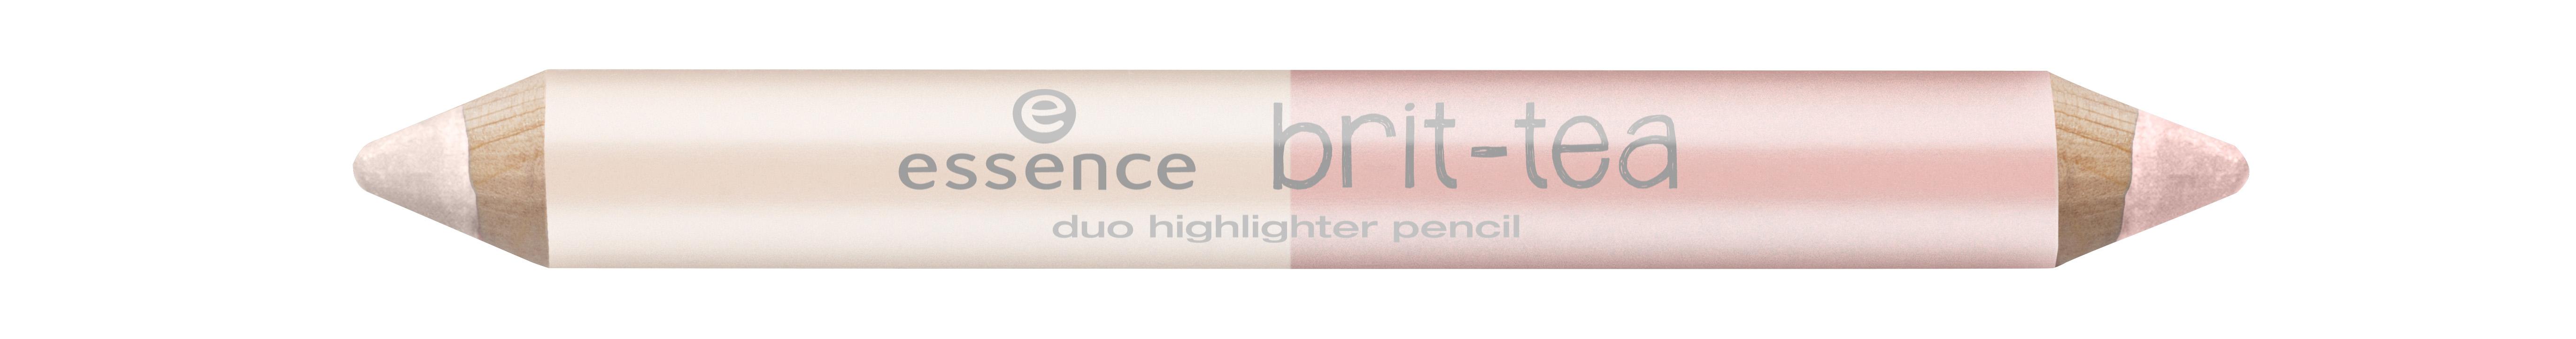 ess_brit-tea_Duo Hightlighter Pencil_offen_#01.jpg